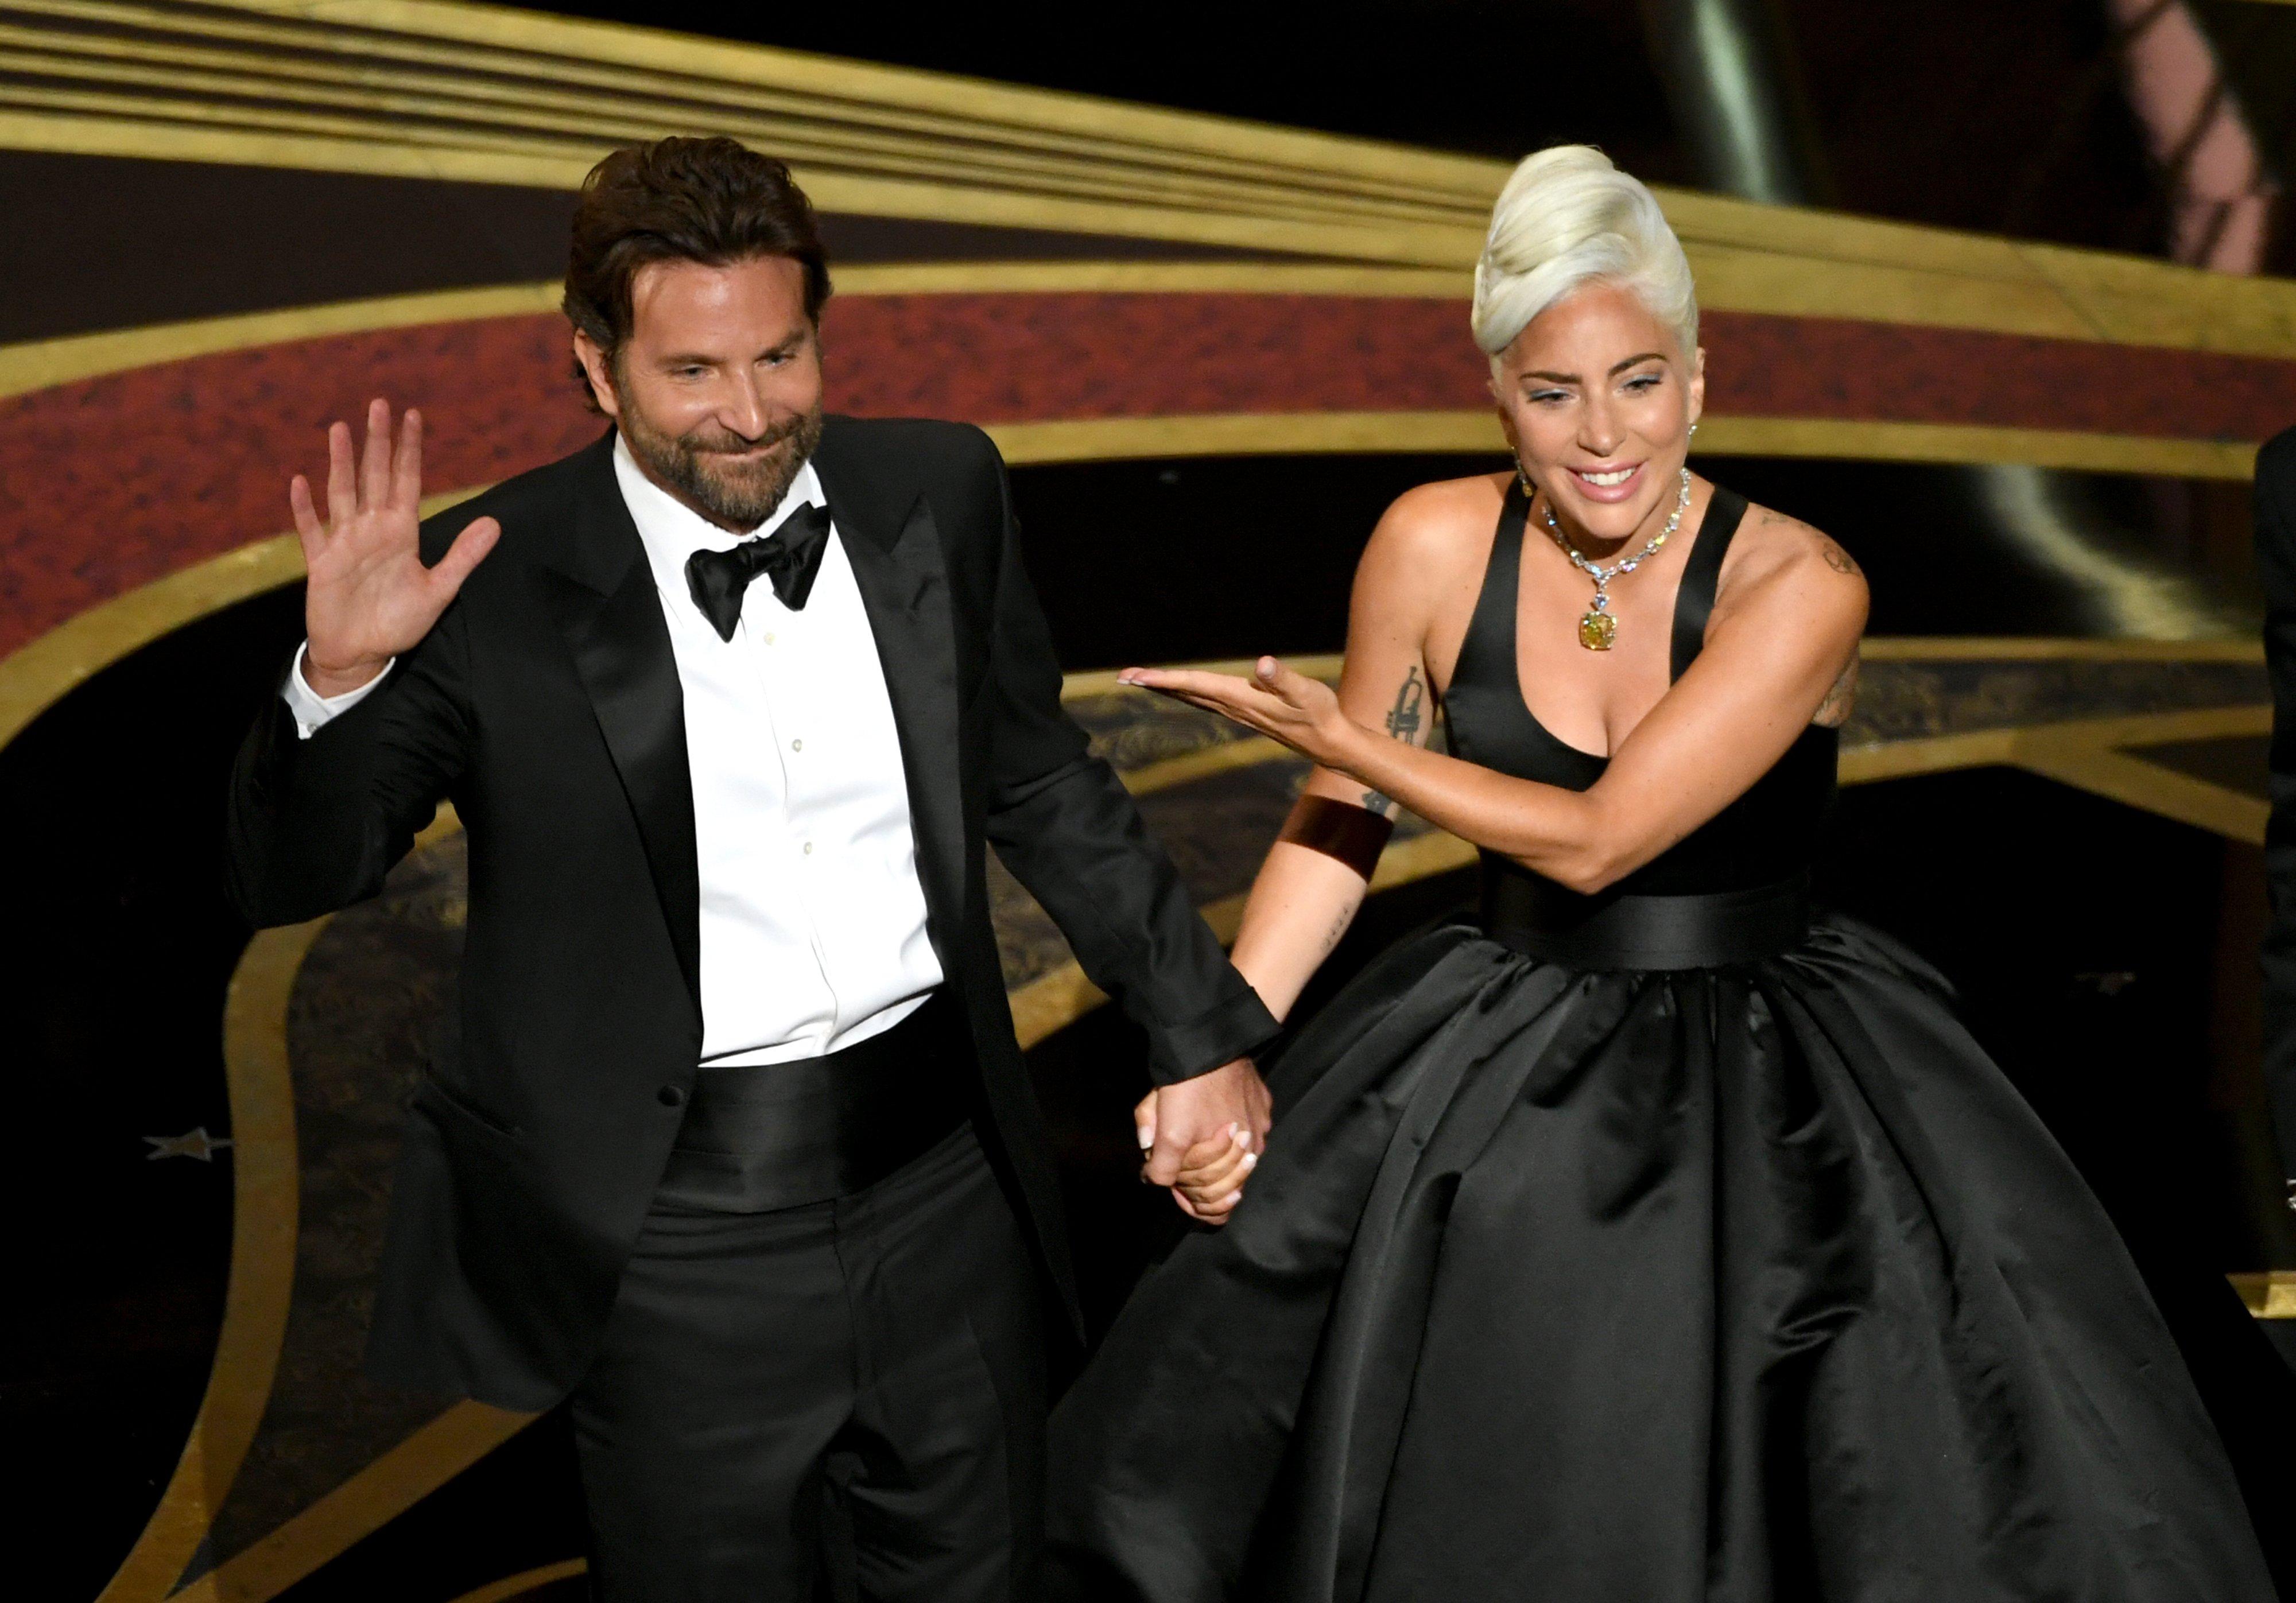 Oscars 2019 Lady Gaga And Bradley Cooper Interviews Photos